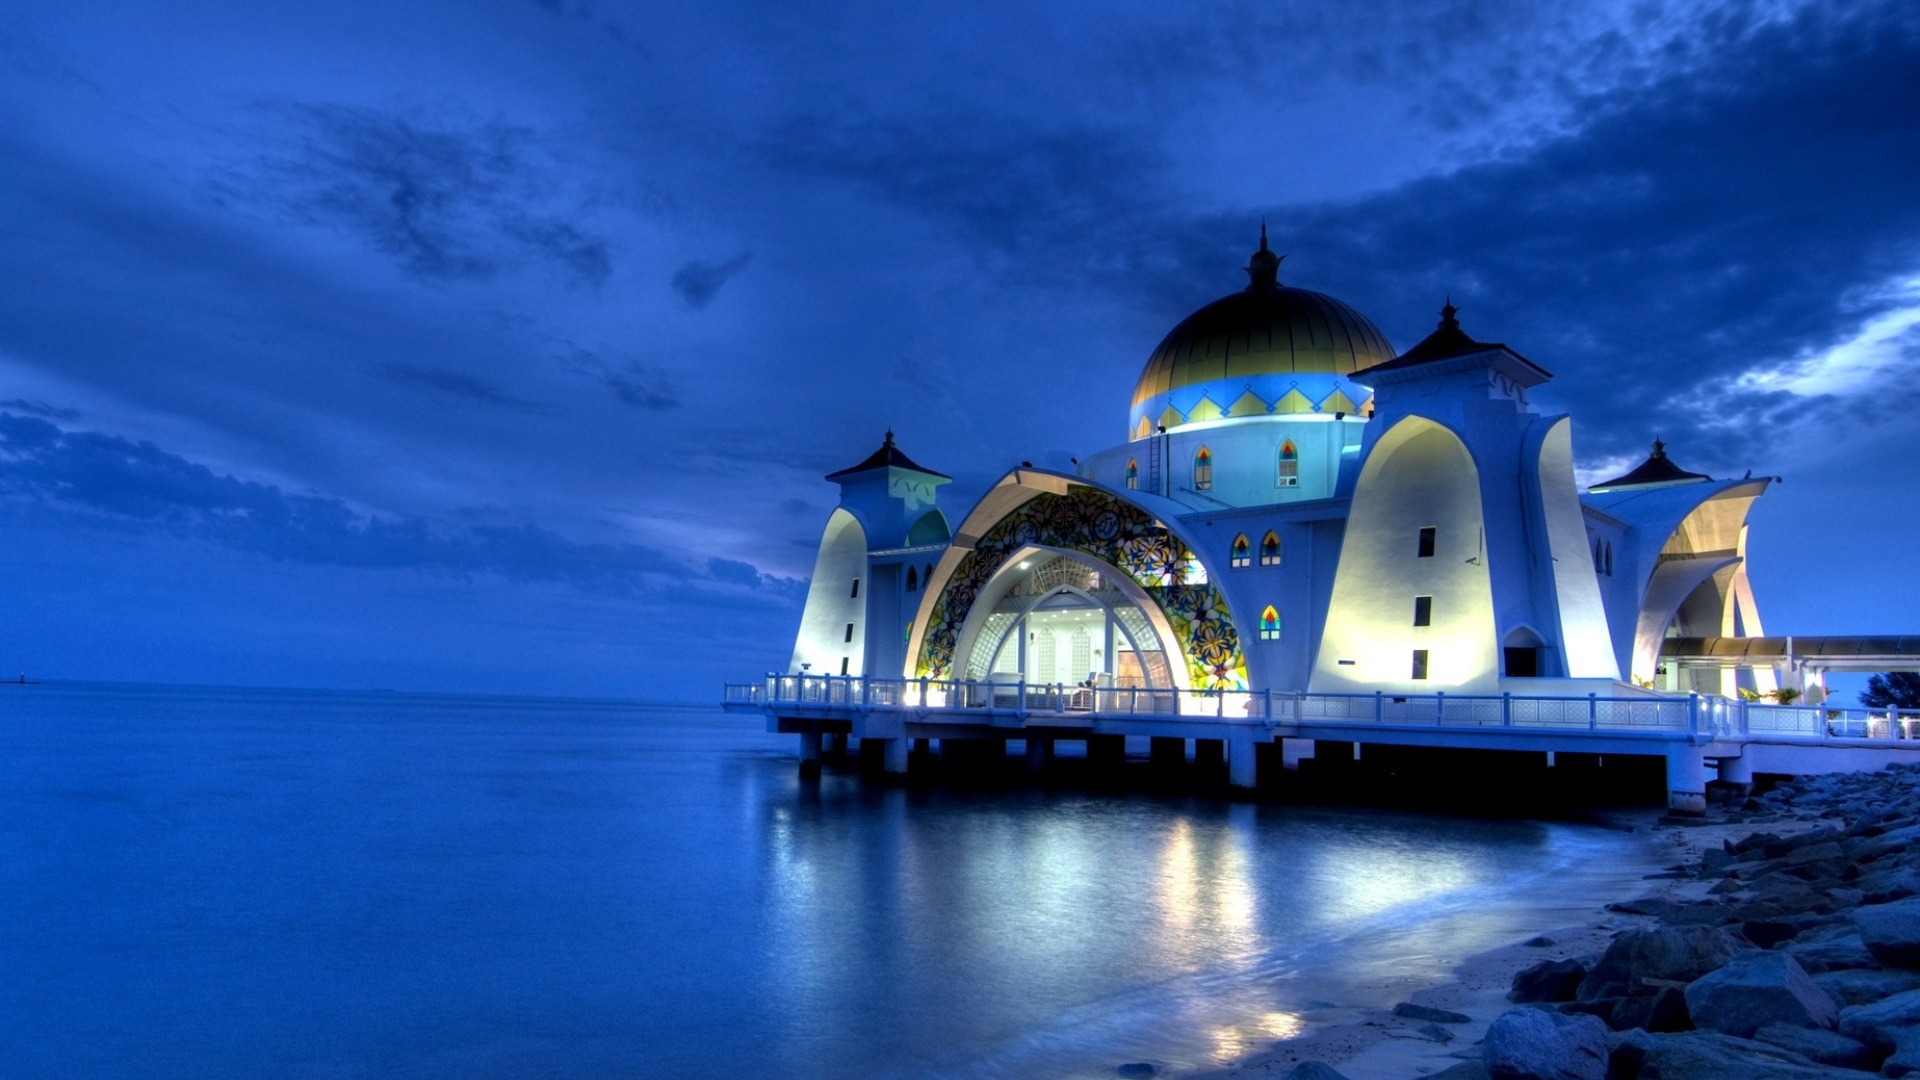 Islamic 3d Wallpapers For Pc Free Download Masjid Selak Melaka Hd Wallpaper Background Image